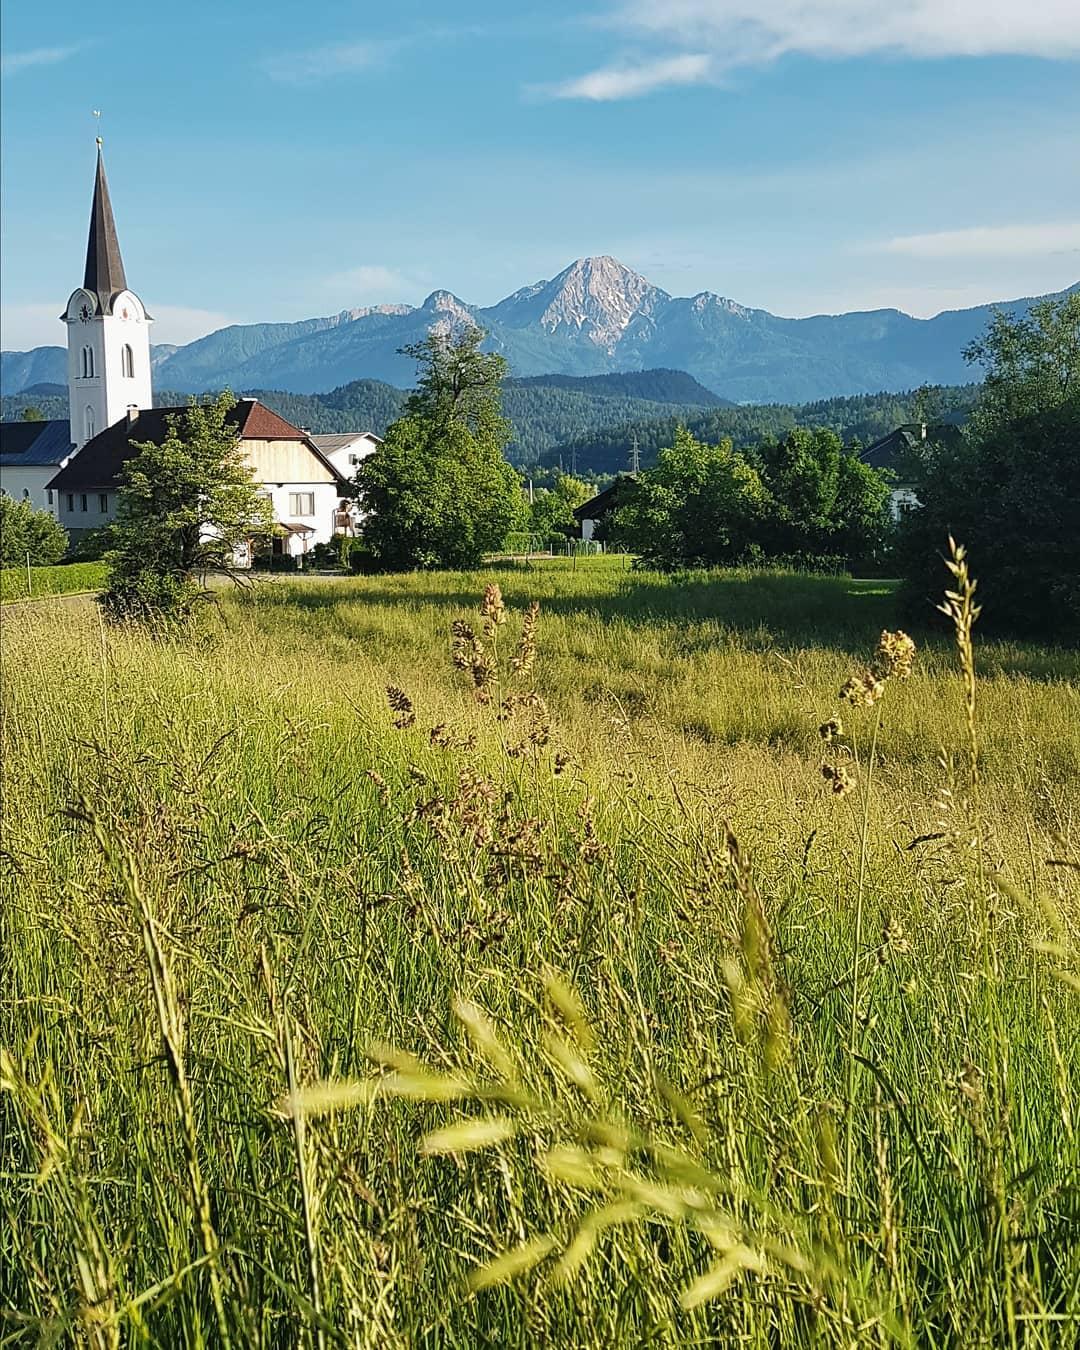 Wonderful view of Wernberg